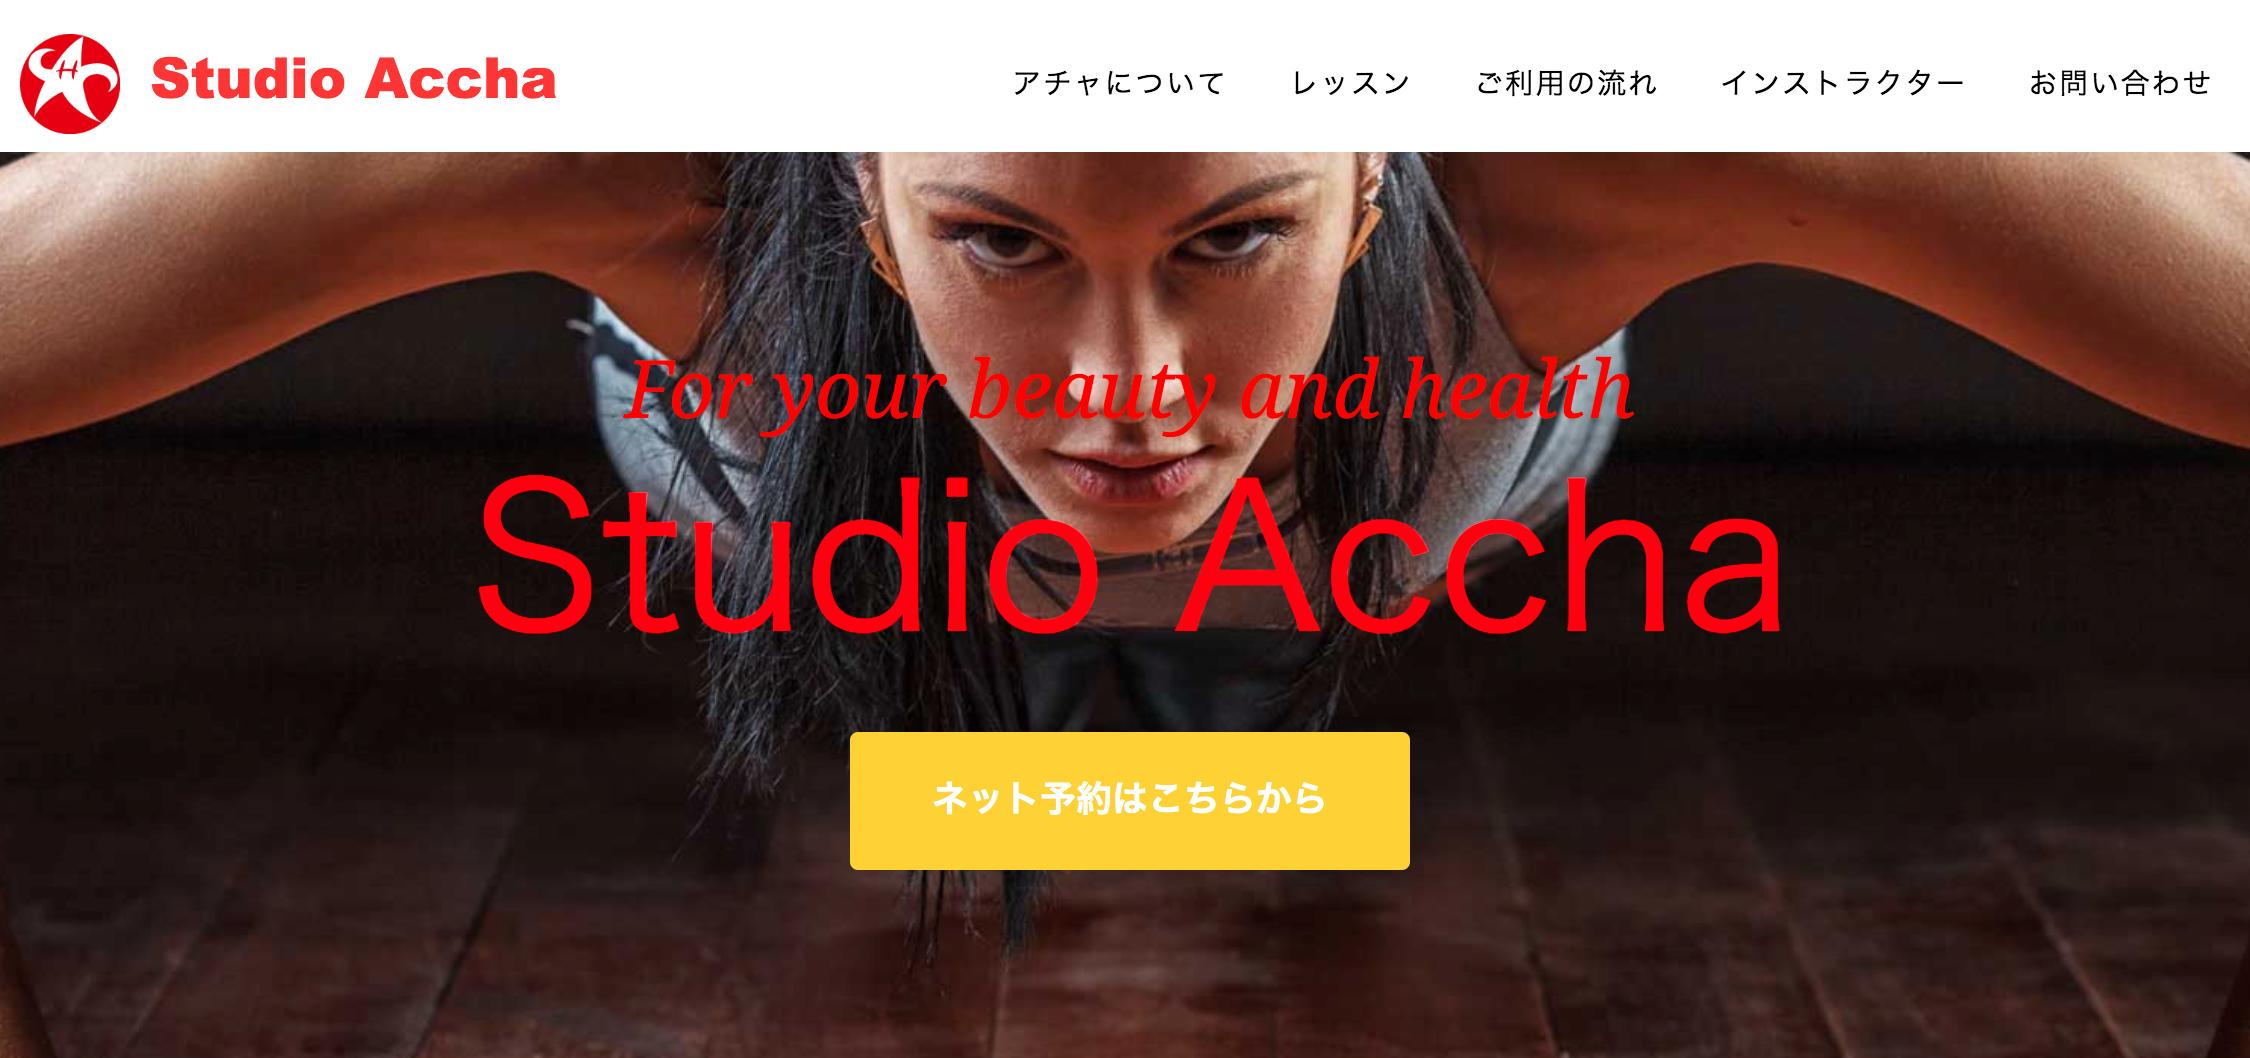 Studio Accha スタジオ アチャの画像